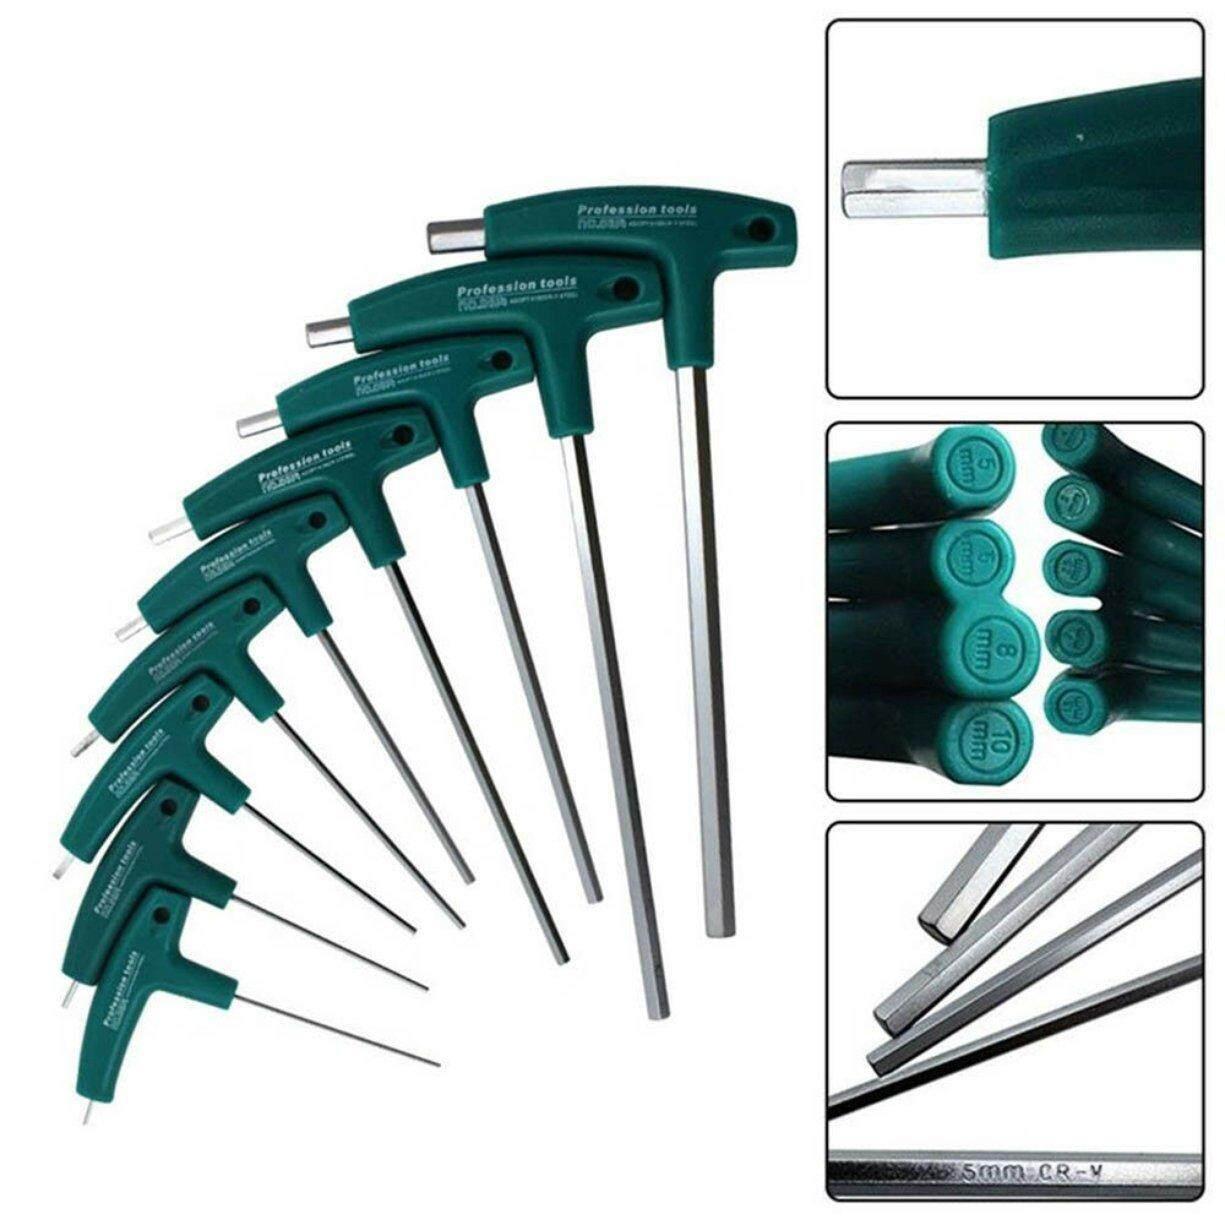 Best Sales T-Handle Hex Allen Key Screws Screwdriver Driver Tool Flat Head Wrenches Set